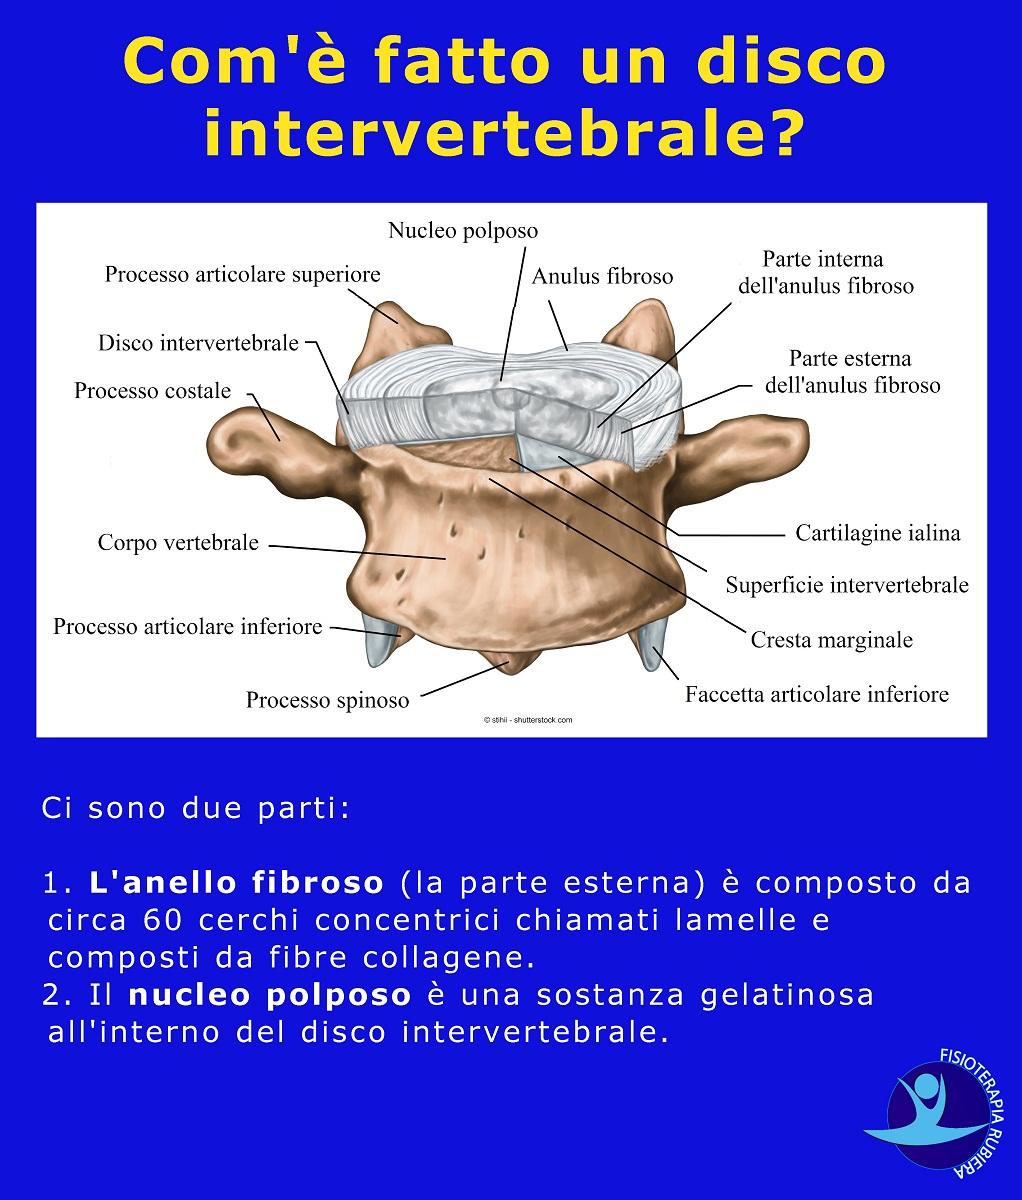 disco-intervertebrale